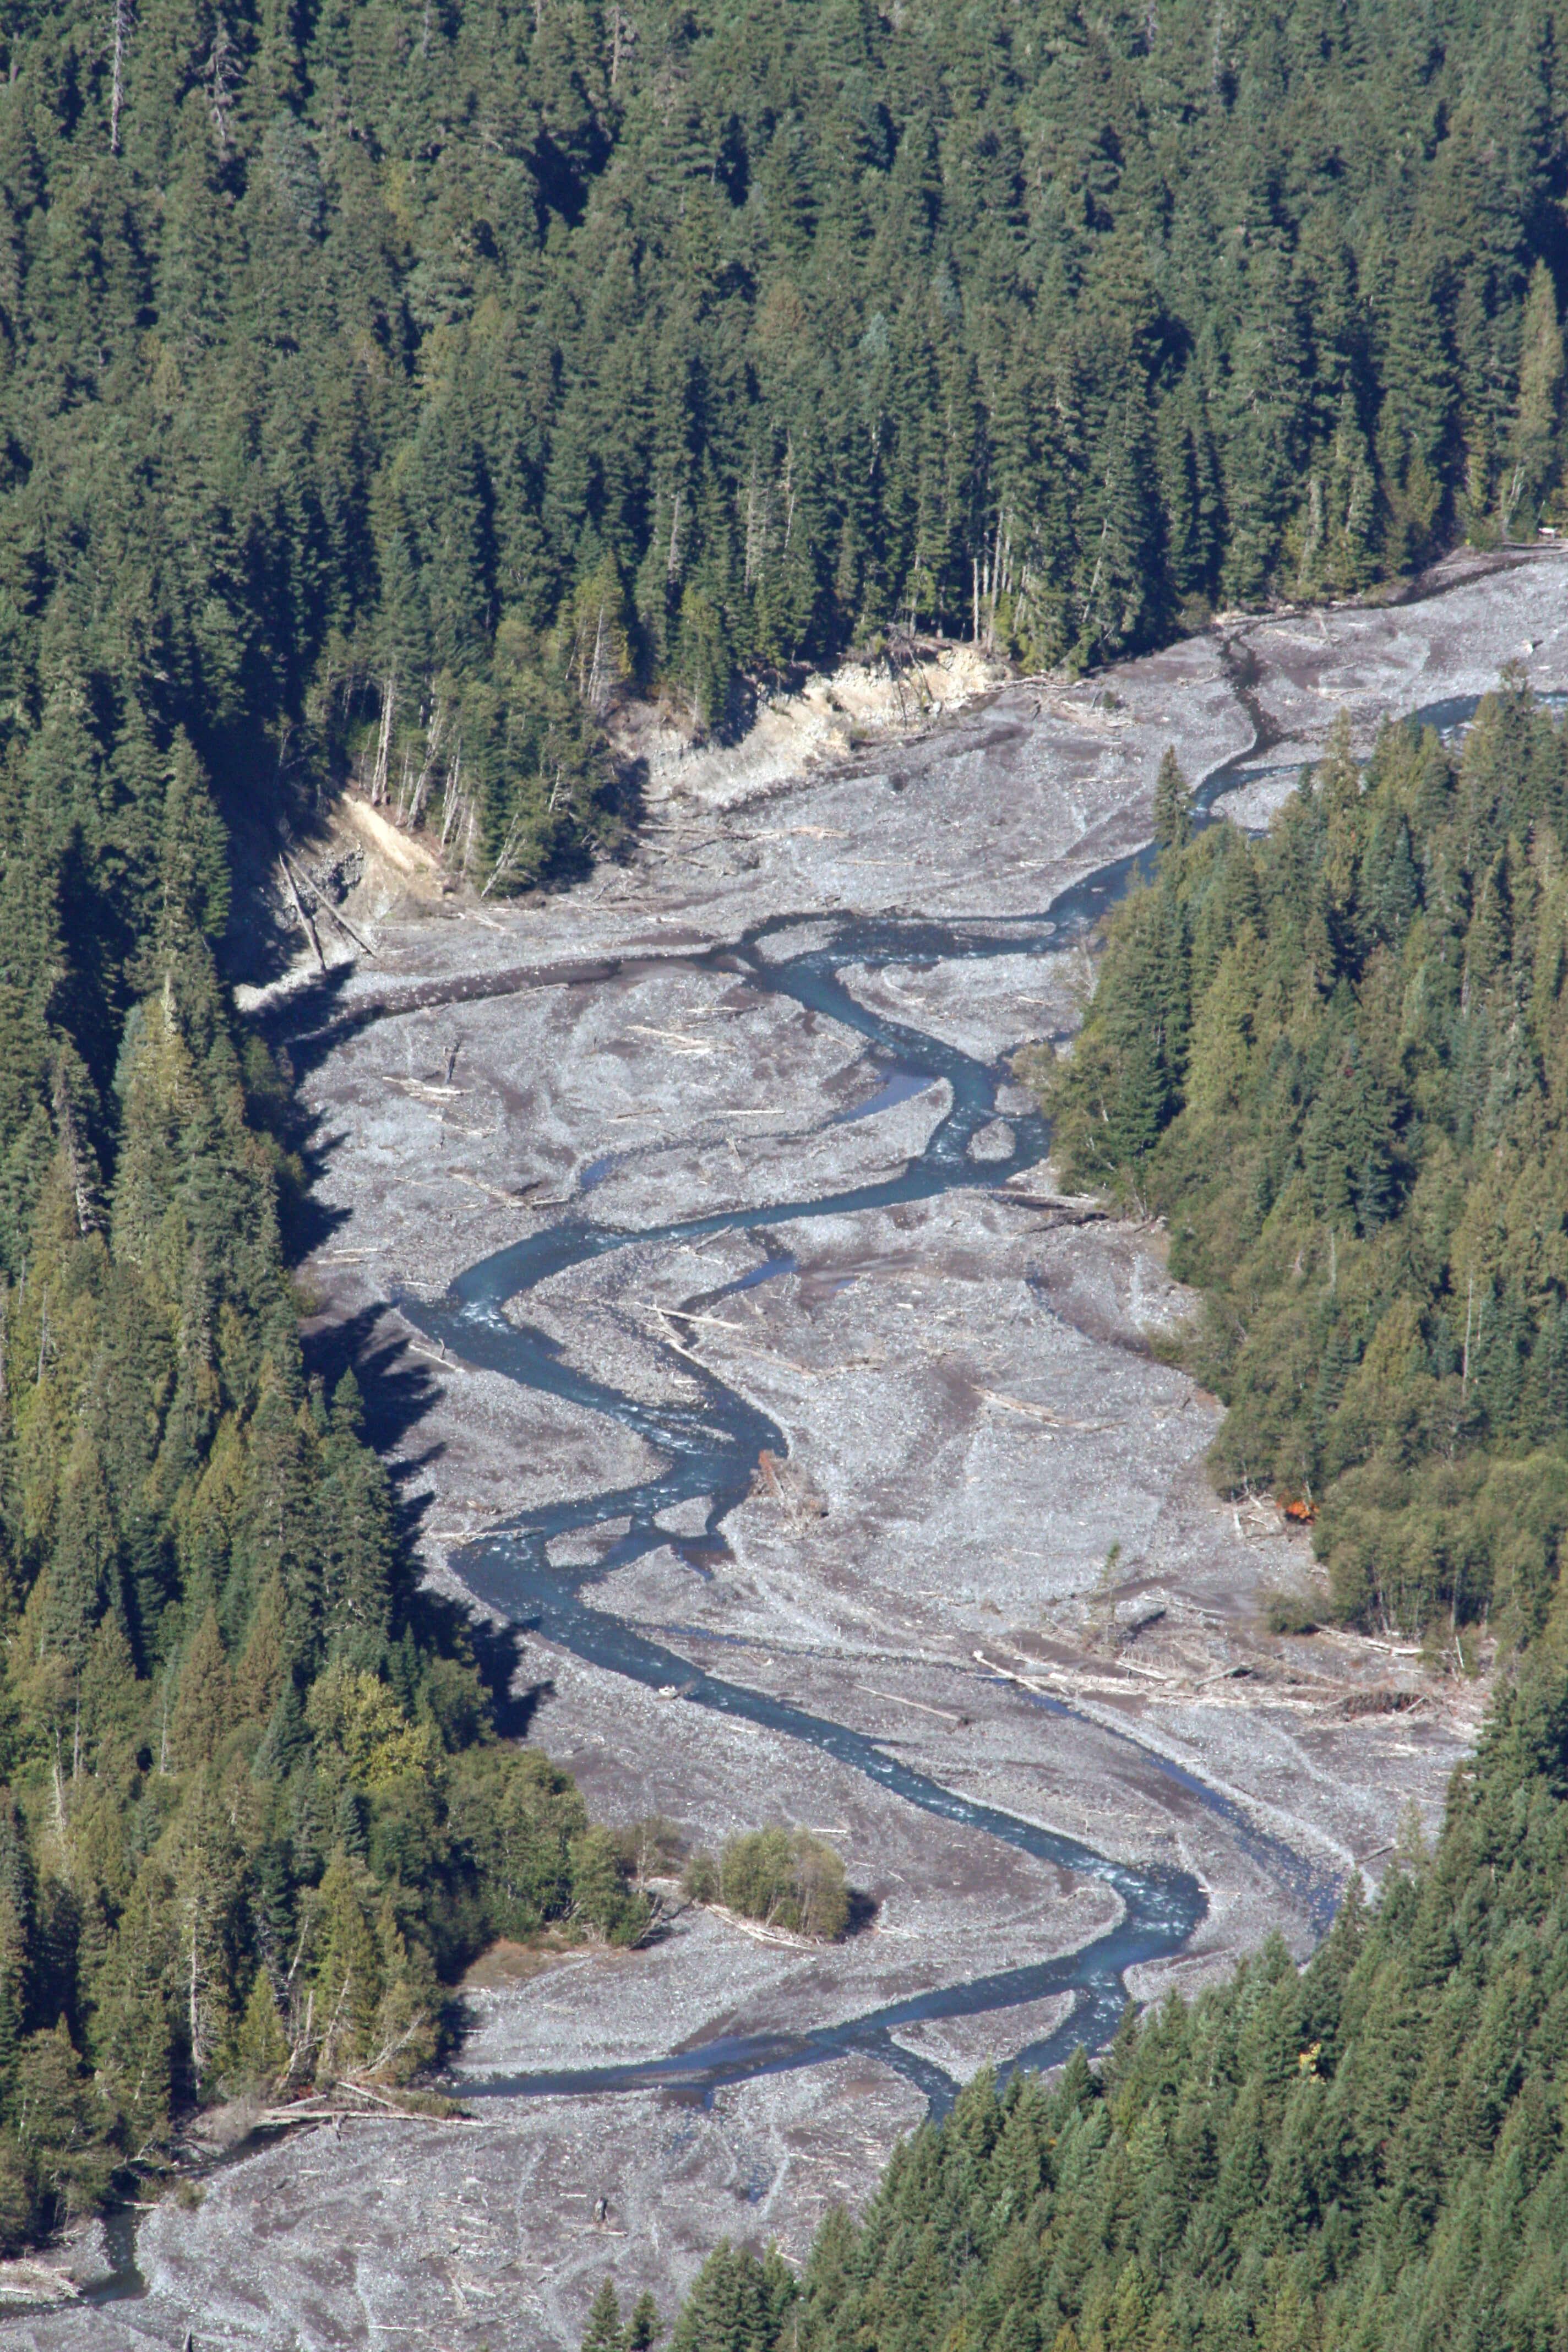 Otherworldly Incantations River Worldbuilding Braided River